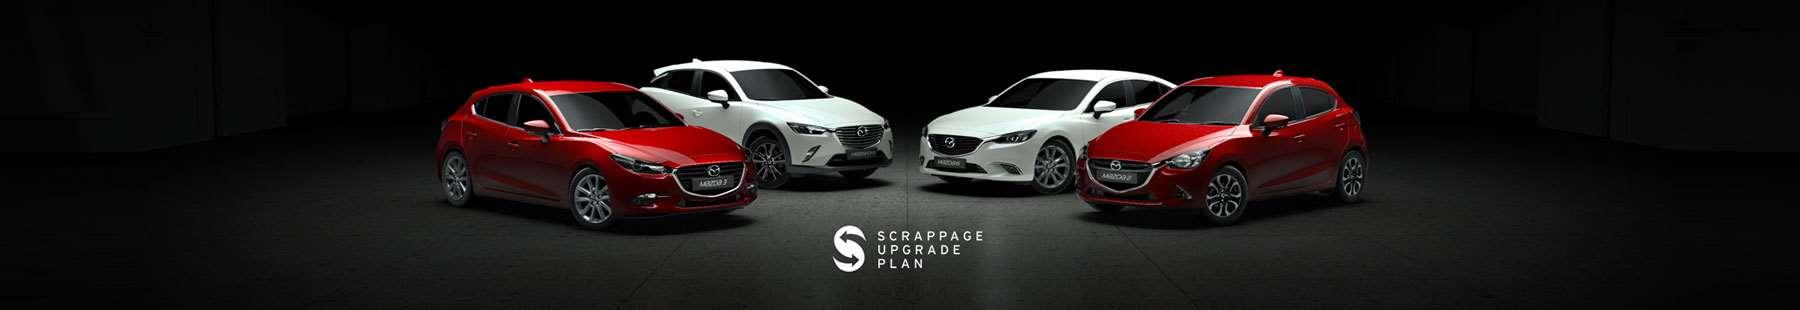 Mazda Scrappage Incentive Scheme